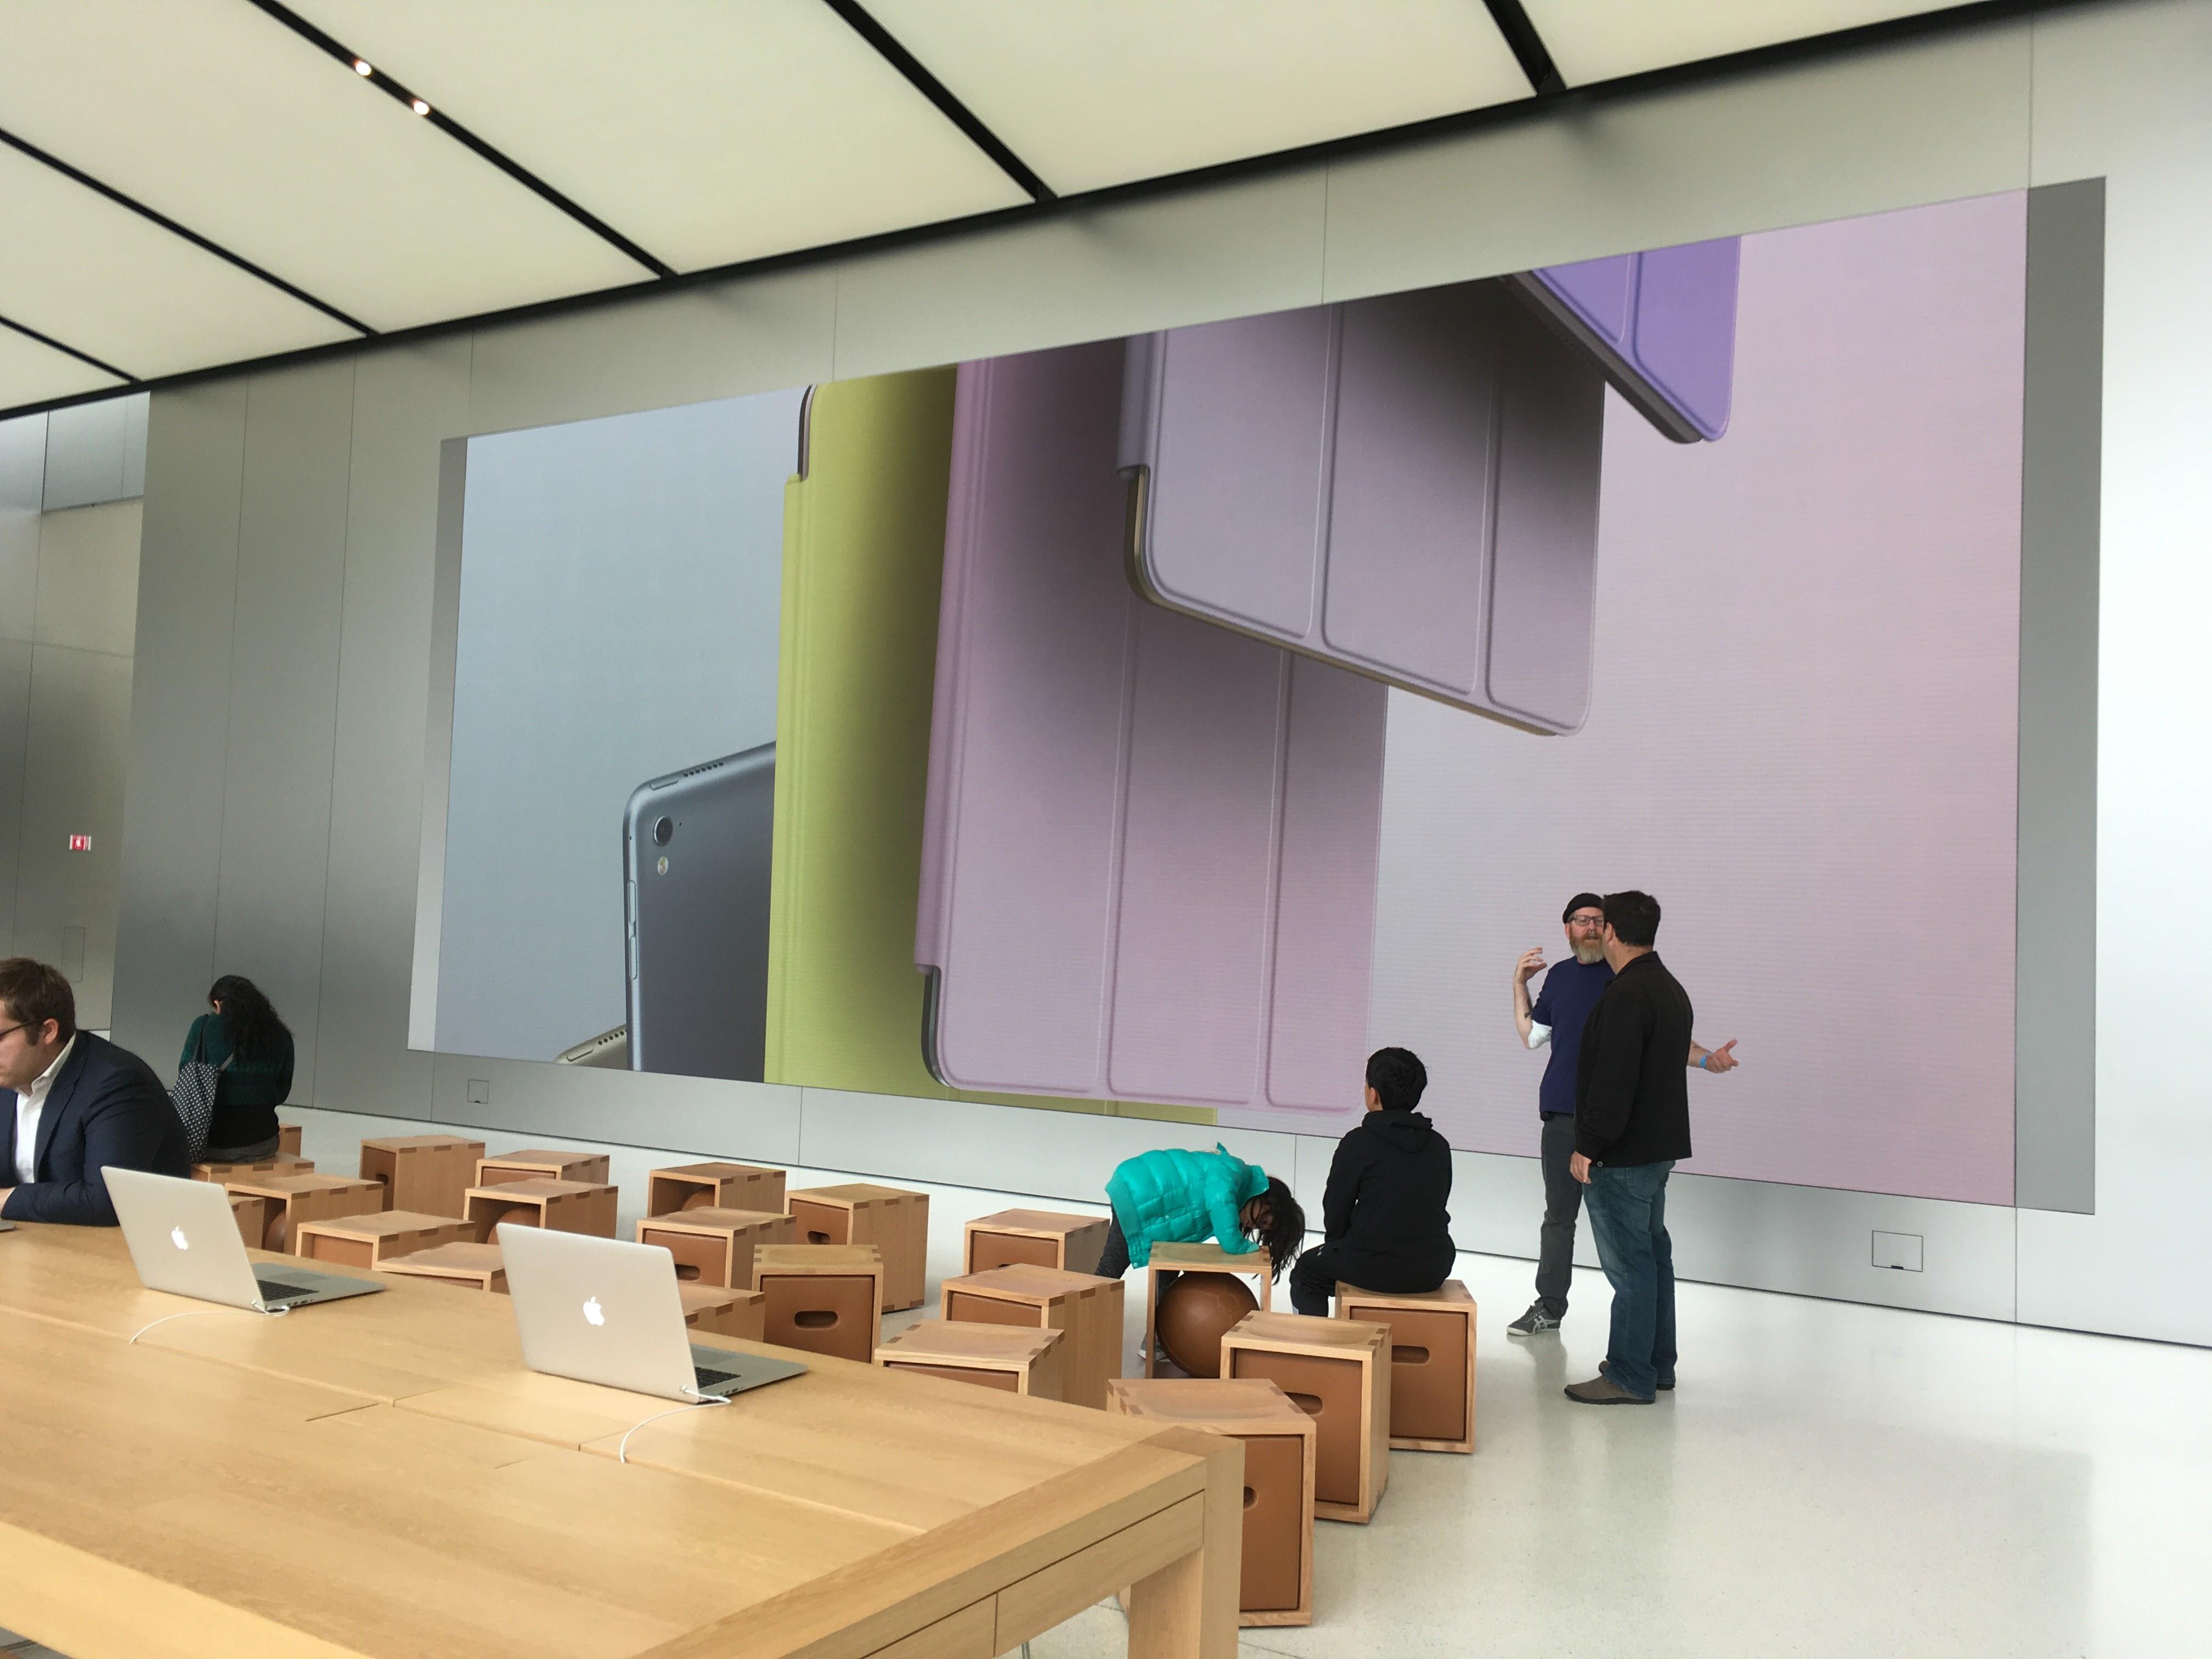 Et gigantisk panel frister med produktbilder.